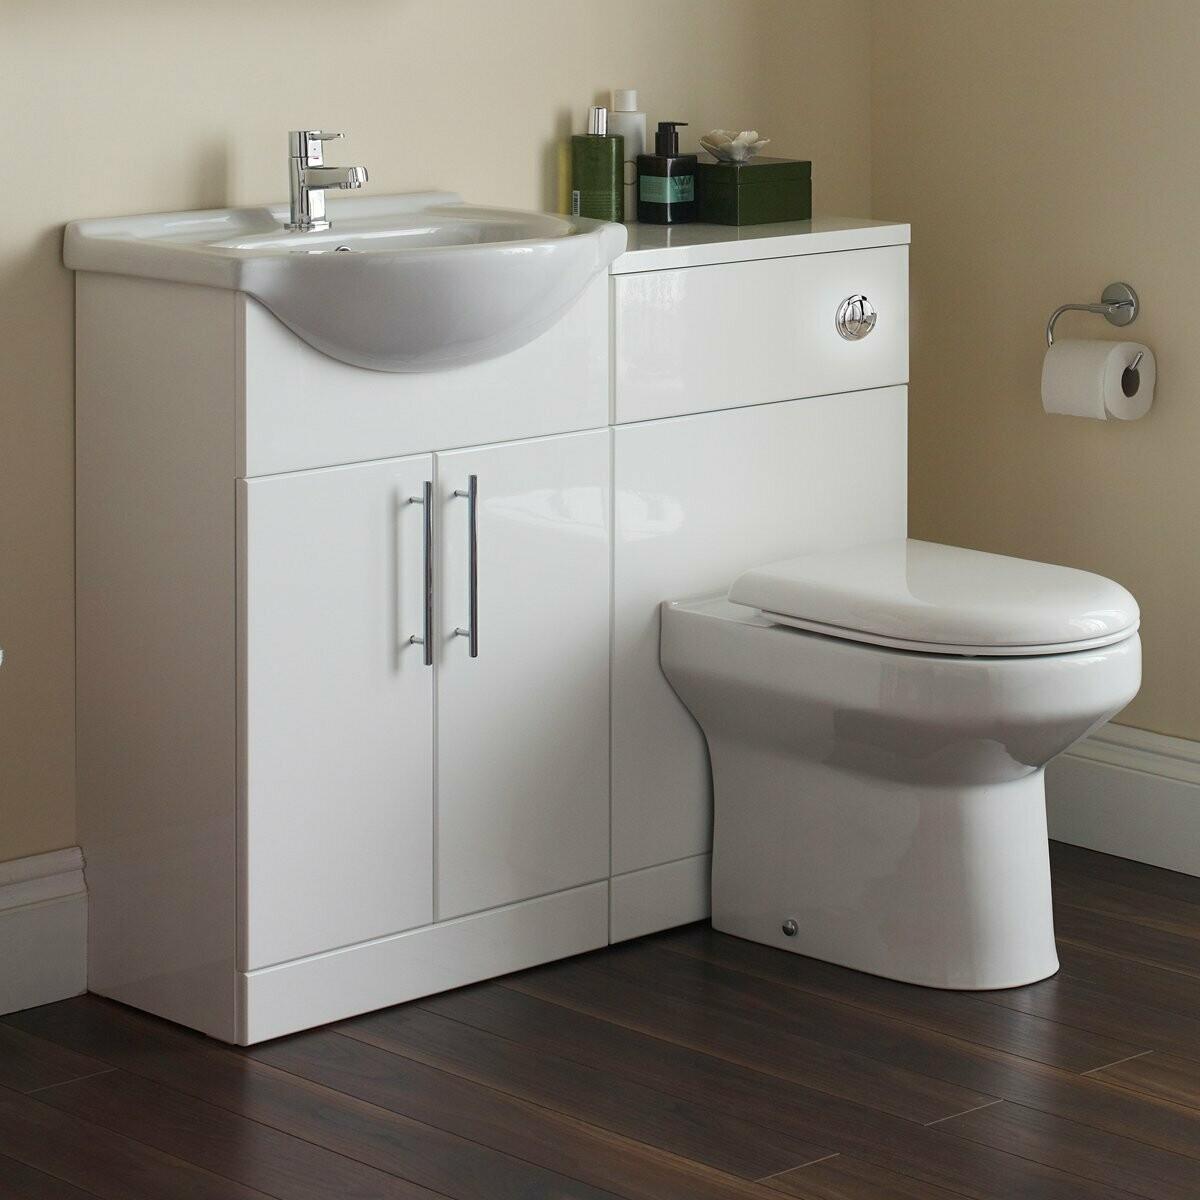 Impakt Set Sink Cabinet Toilet Cabinet Cistern Soft Close Seat